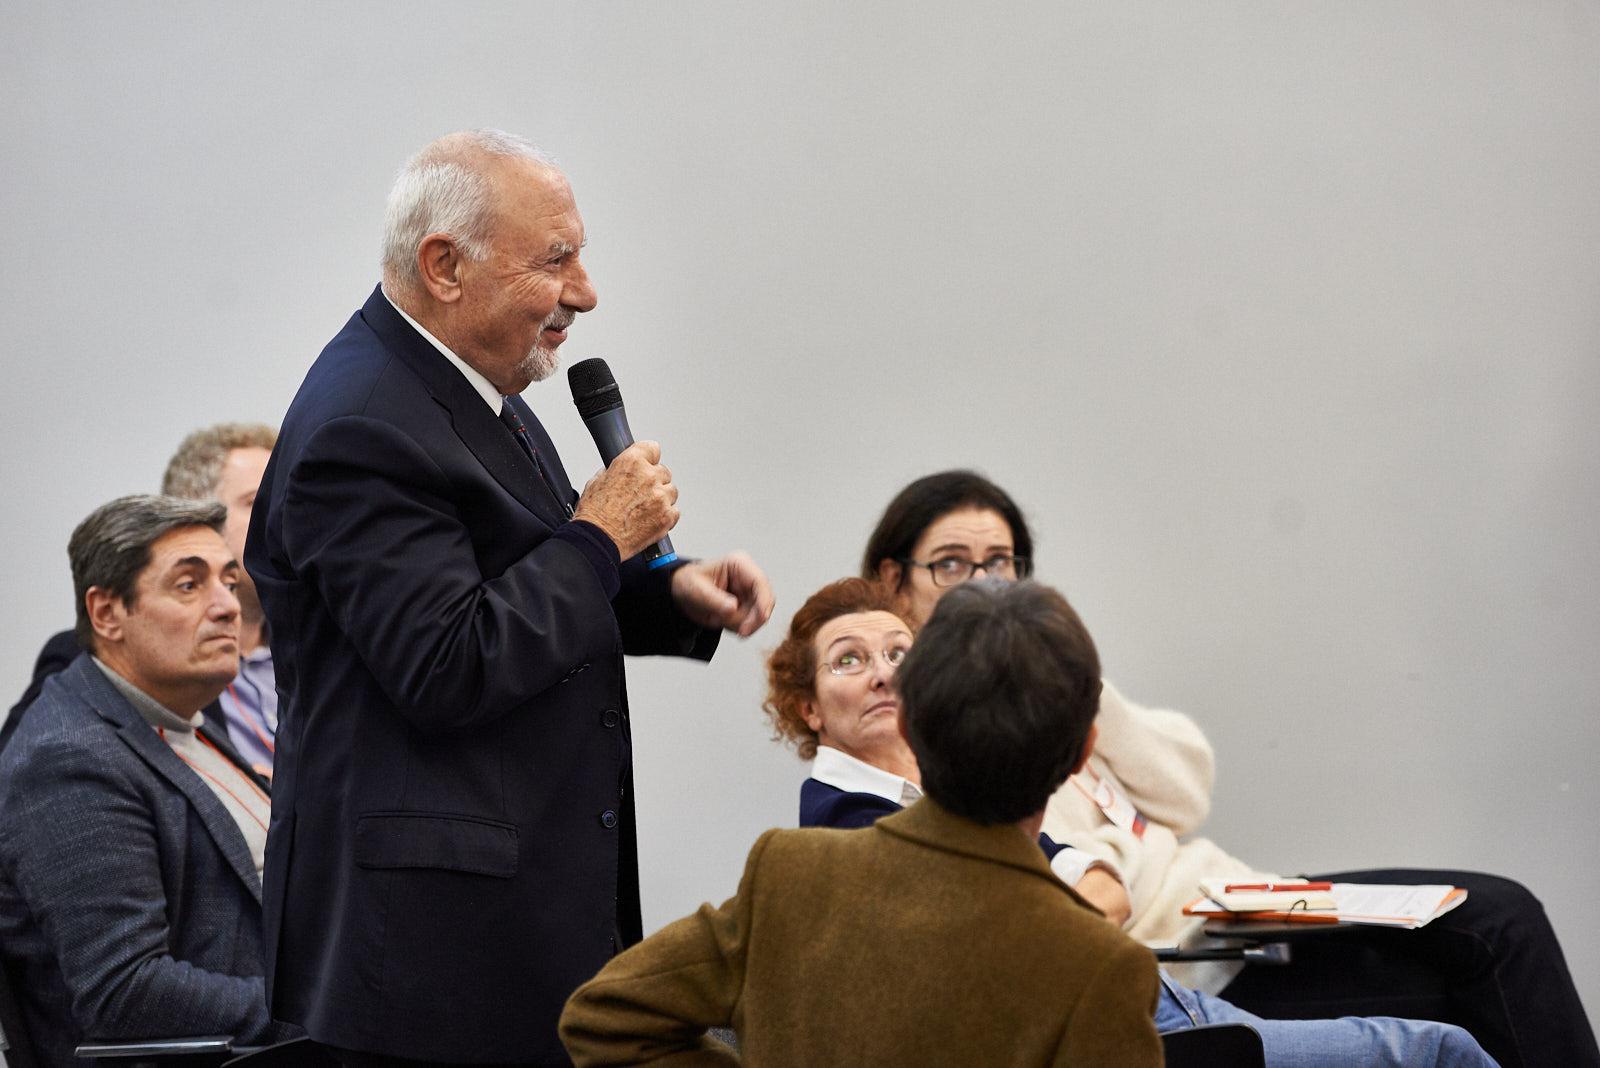 Pietro Kuciukian, Honorary Consul of Armenia in Italy and co-founder of Gariwo